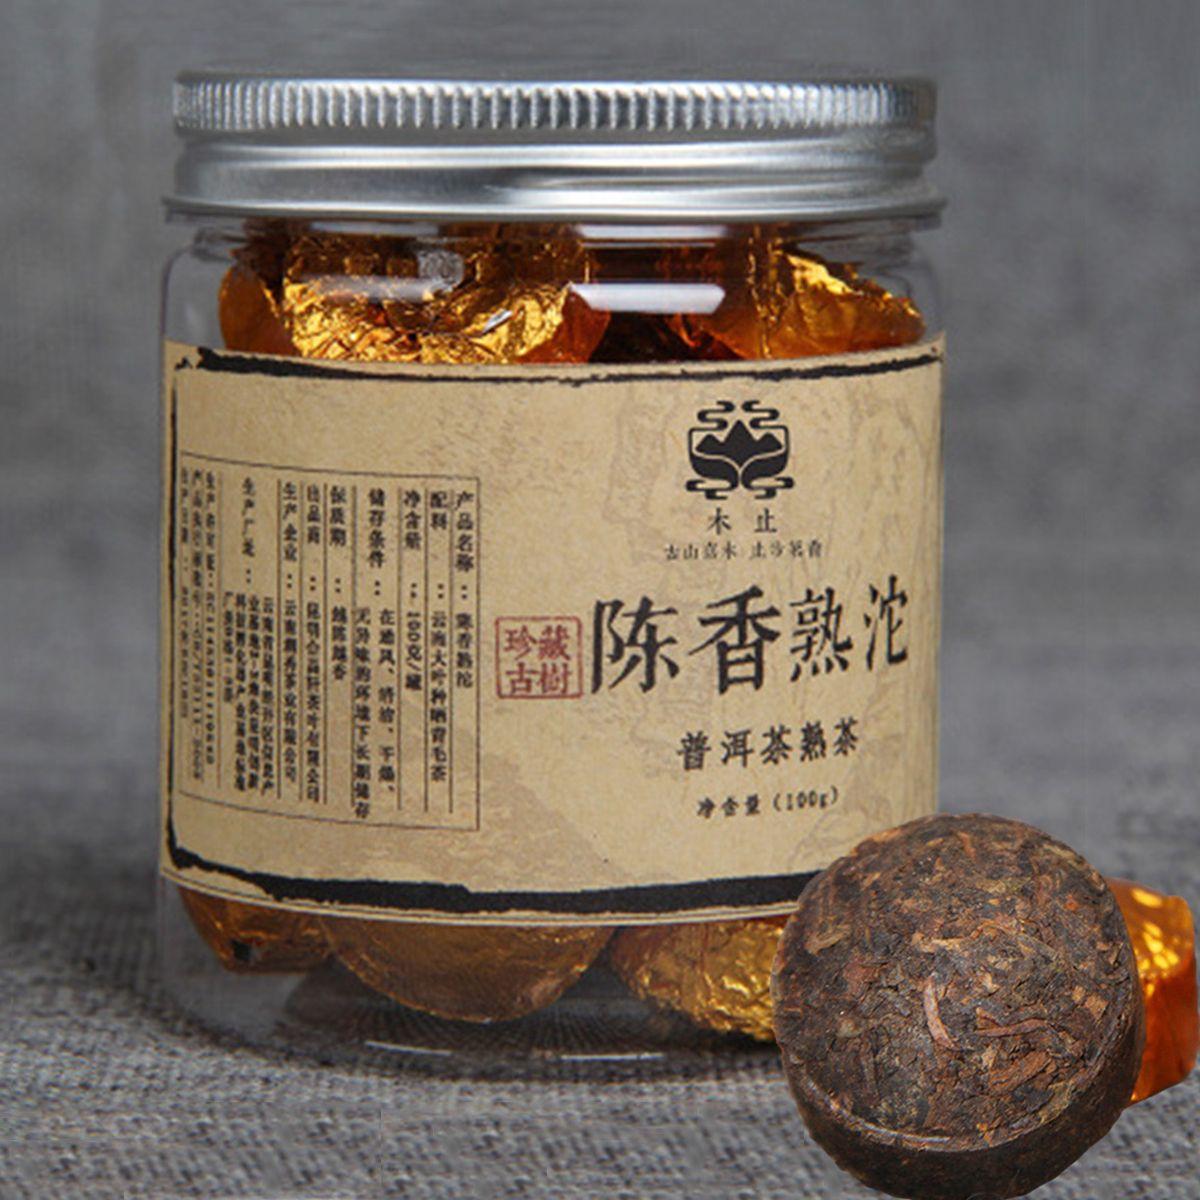 Fragancia 100g madura Puer de Yunnan Pequeño enlatados glutinoso Negro antiguo Puer Orgánica Natural Cocido ventas Puer té caliente